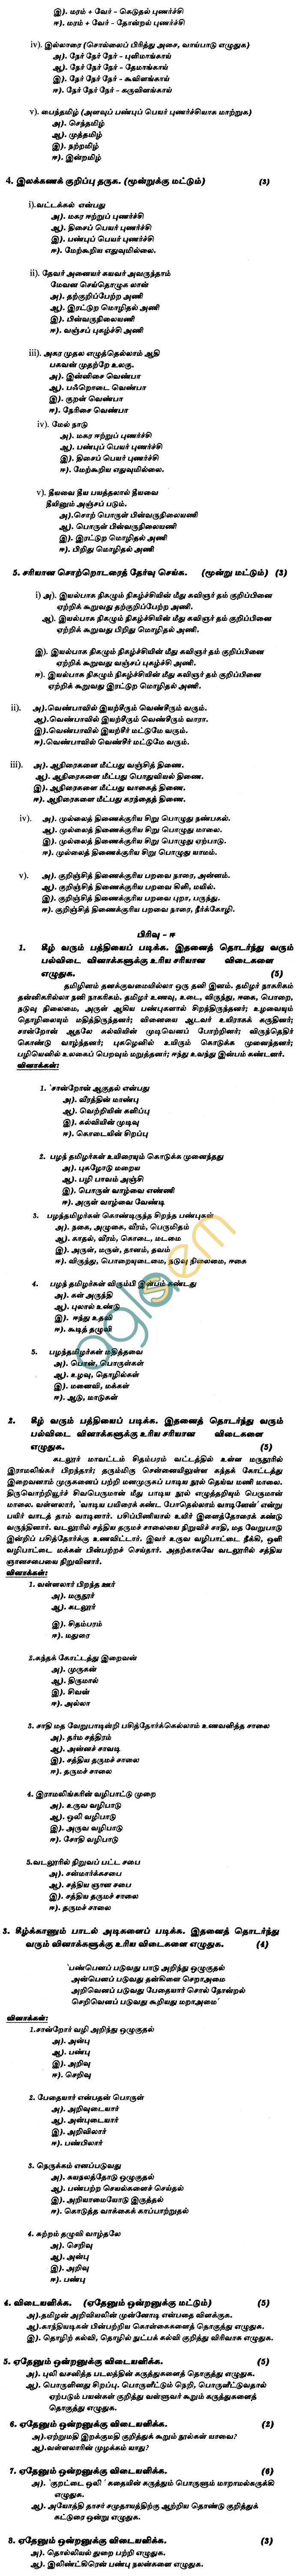 CBSE Class IX & X Sample Papers 2014 (Second Term) Tamil